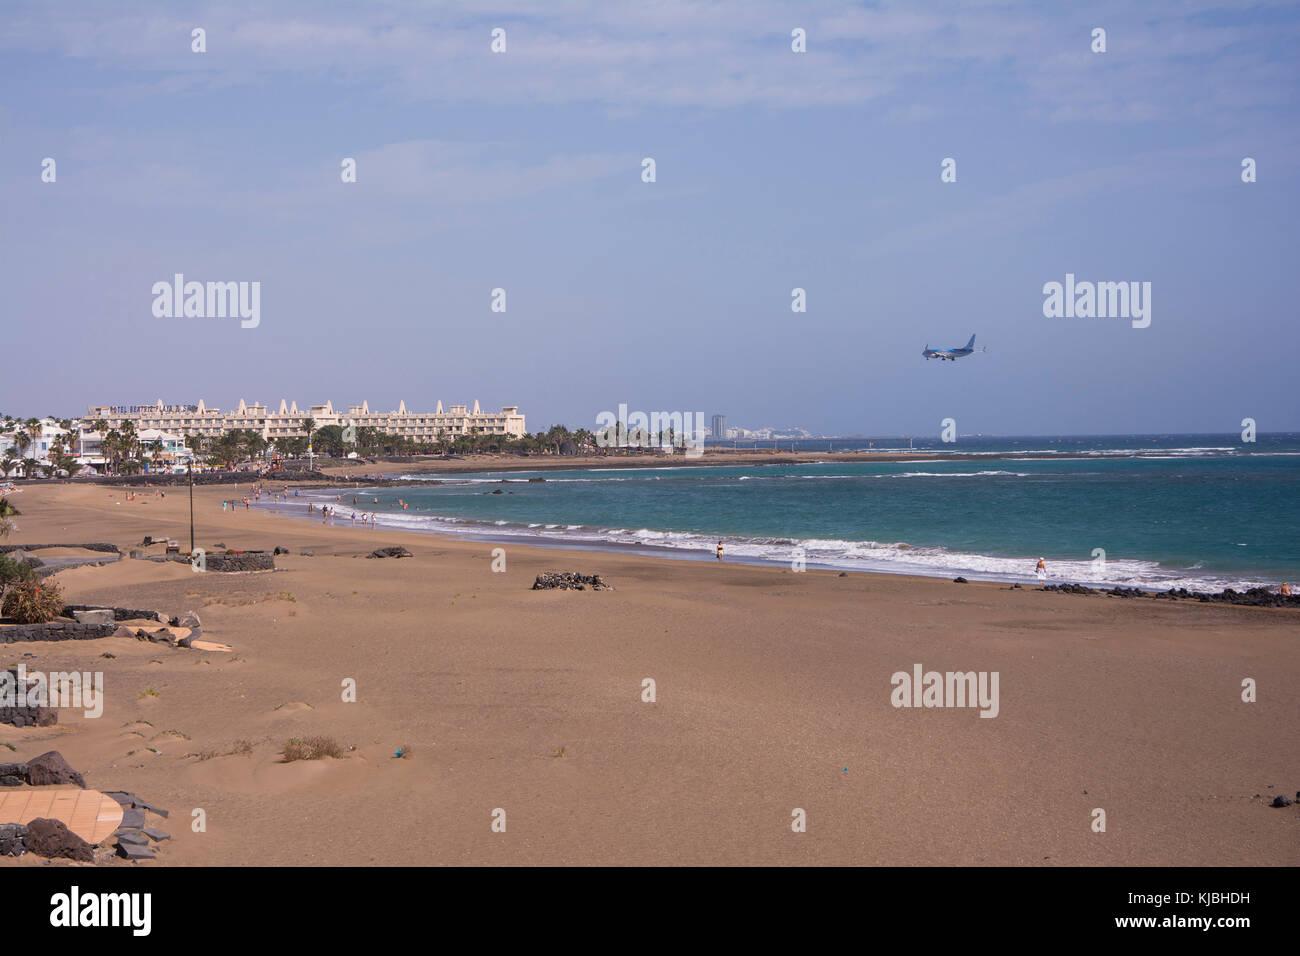 Strand Los Pocillos mit einem Flugzeug an am Flughafen Arrecife Stockbild